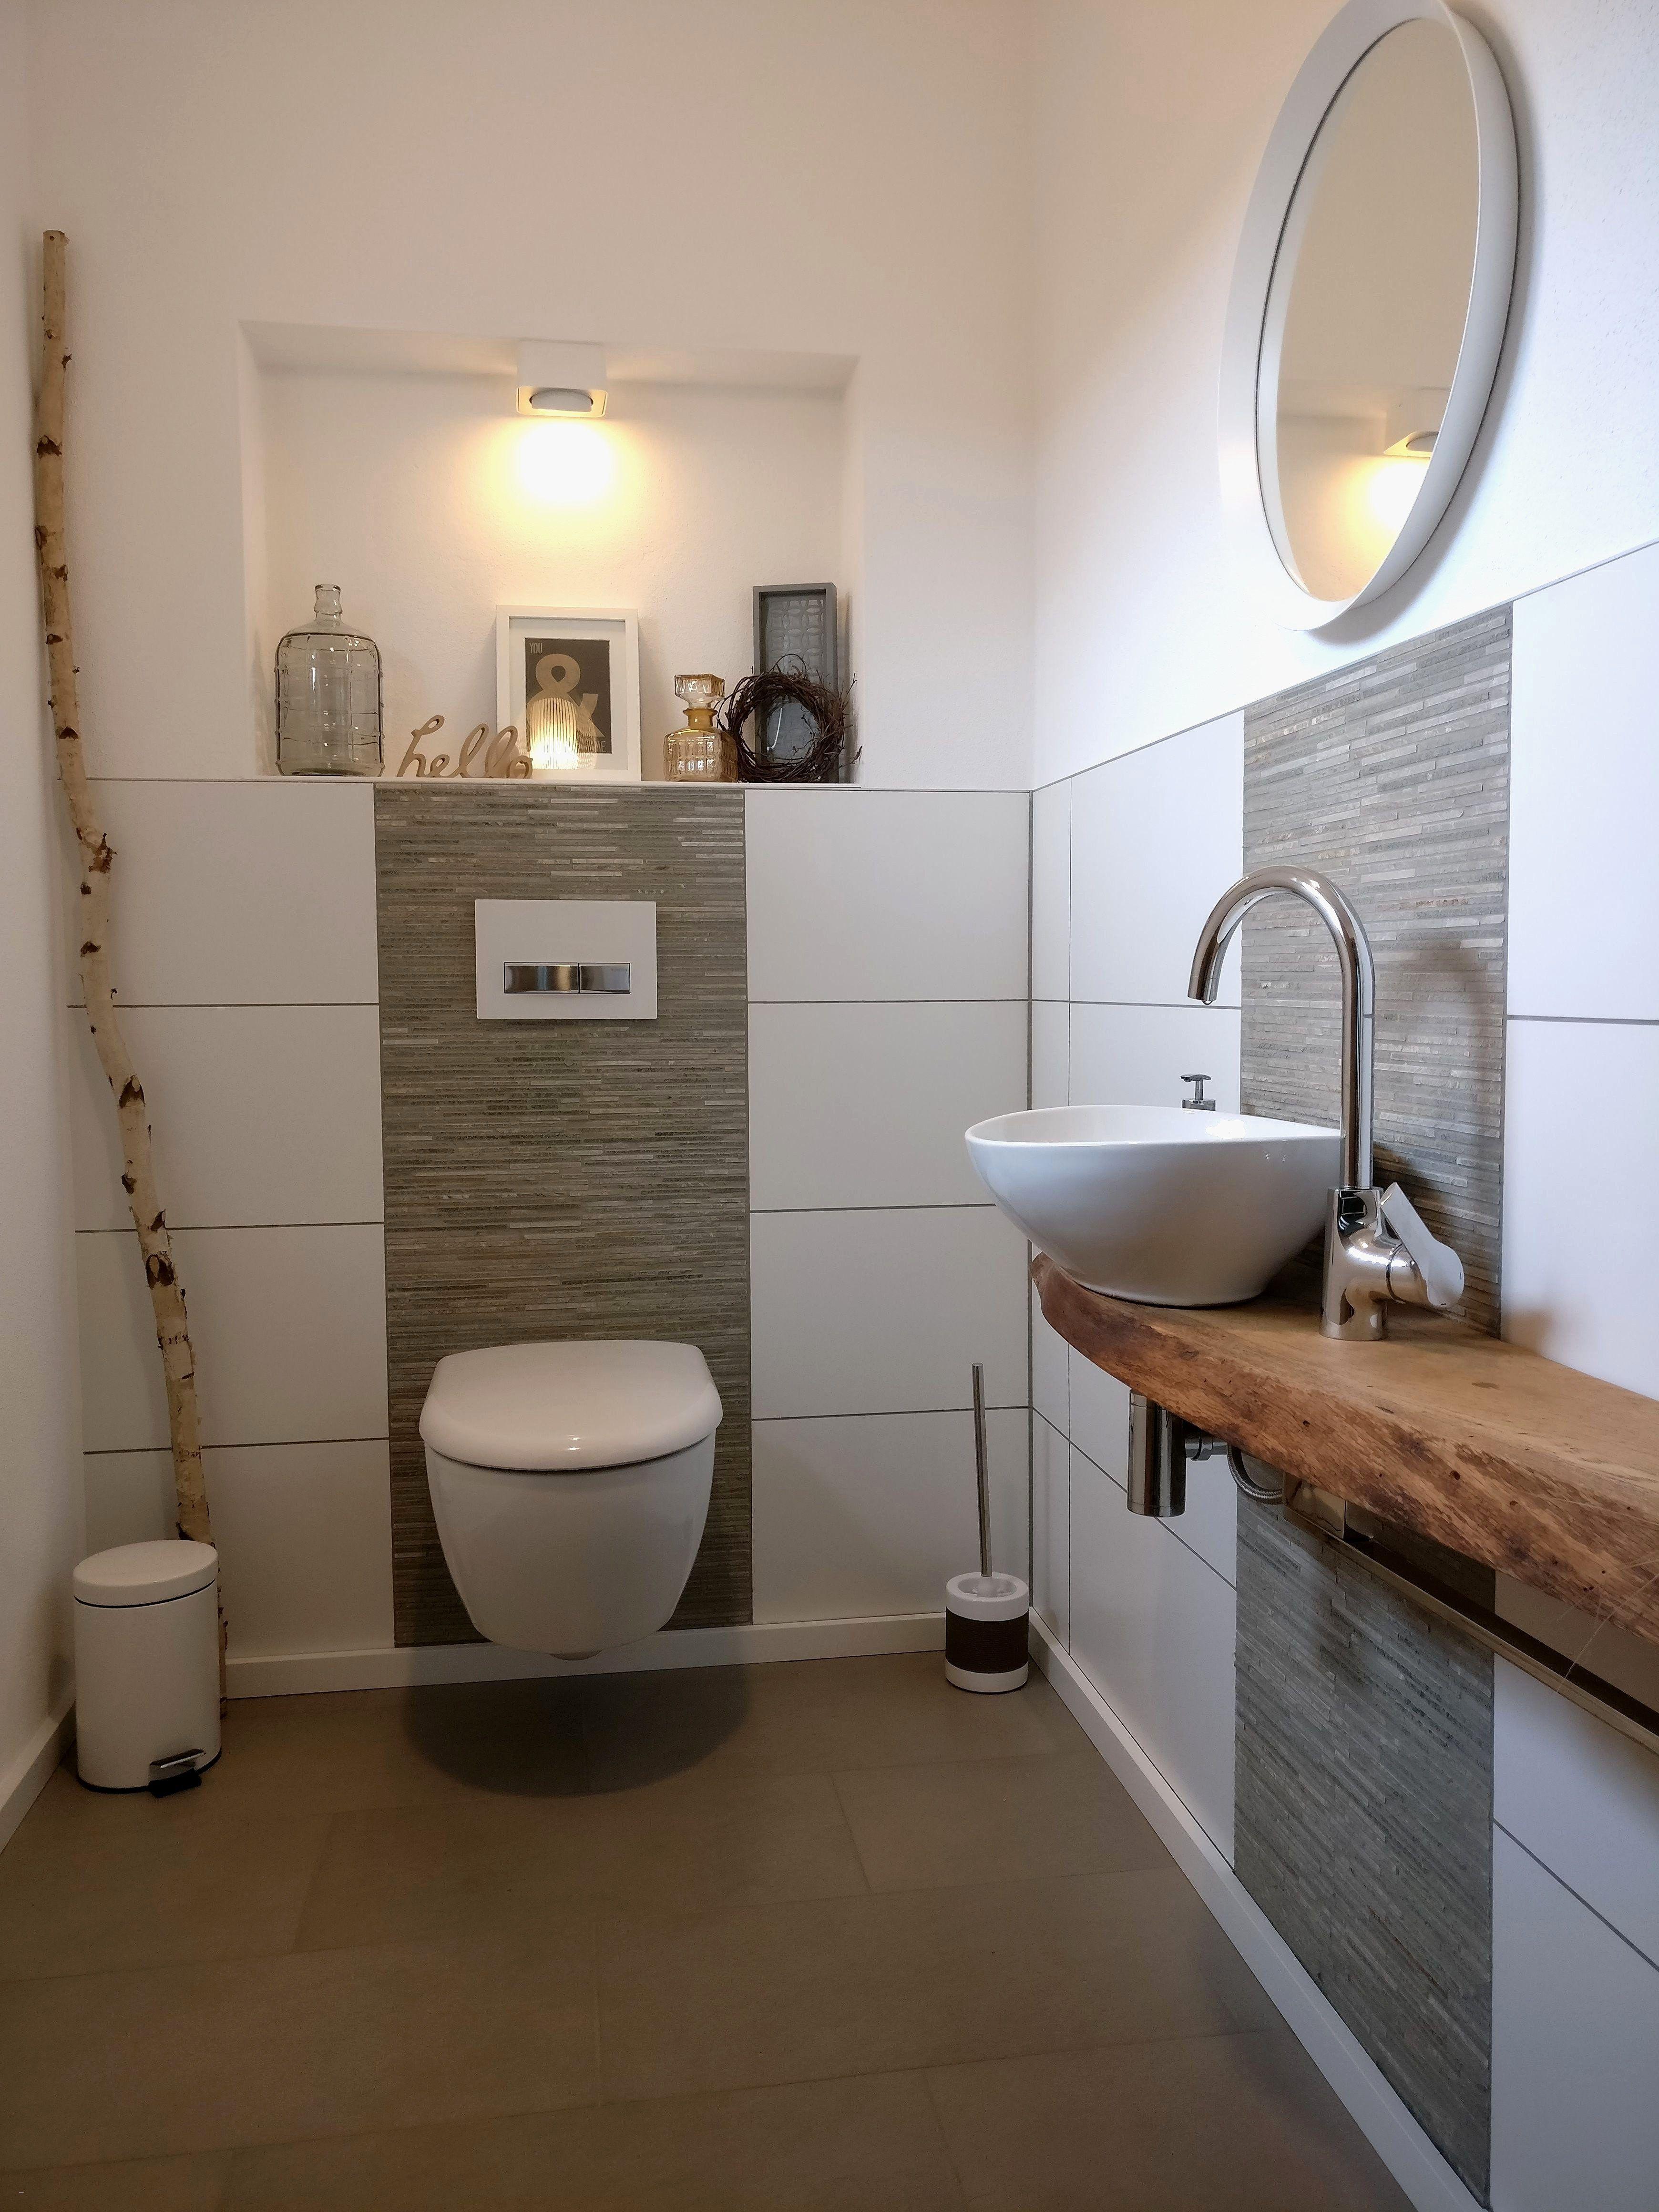 11 Verbluffend Badezimmer Renovieren Selbst Youtube Eintagamsee Pequenos Azulejos Del Bano Diseno De Banos Modernos Bano De Invitados